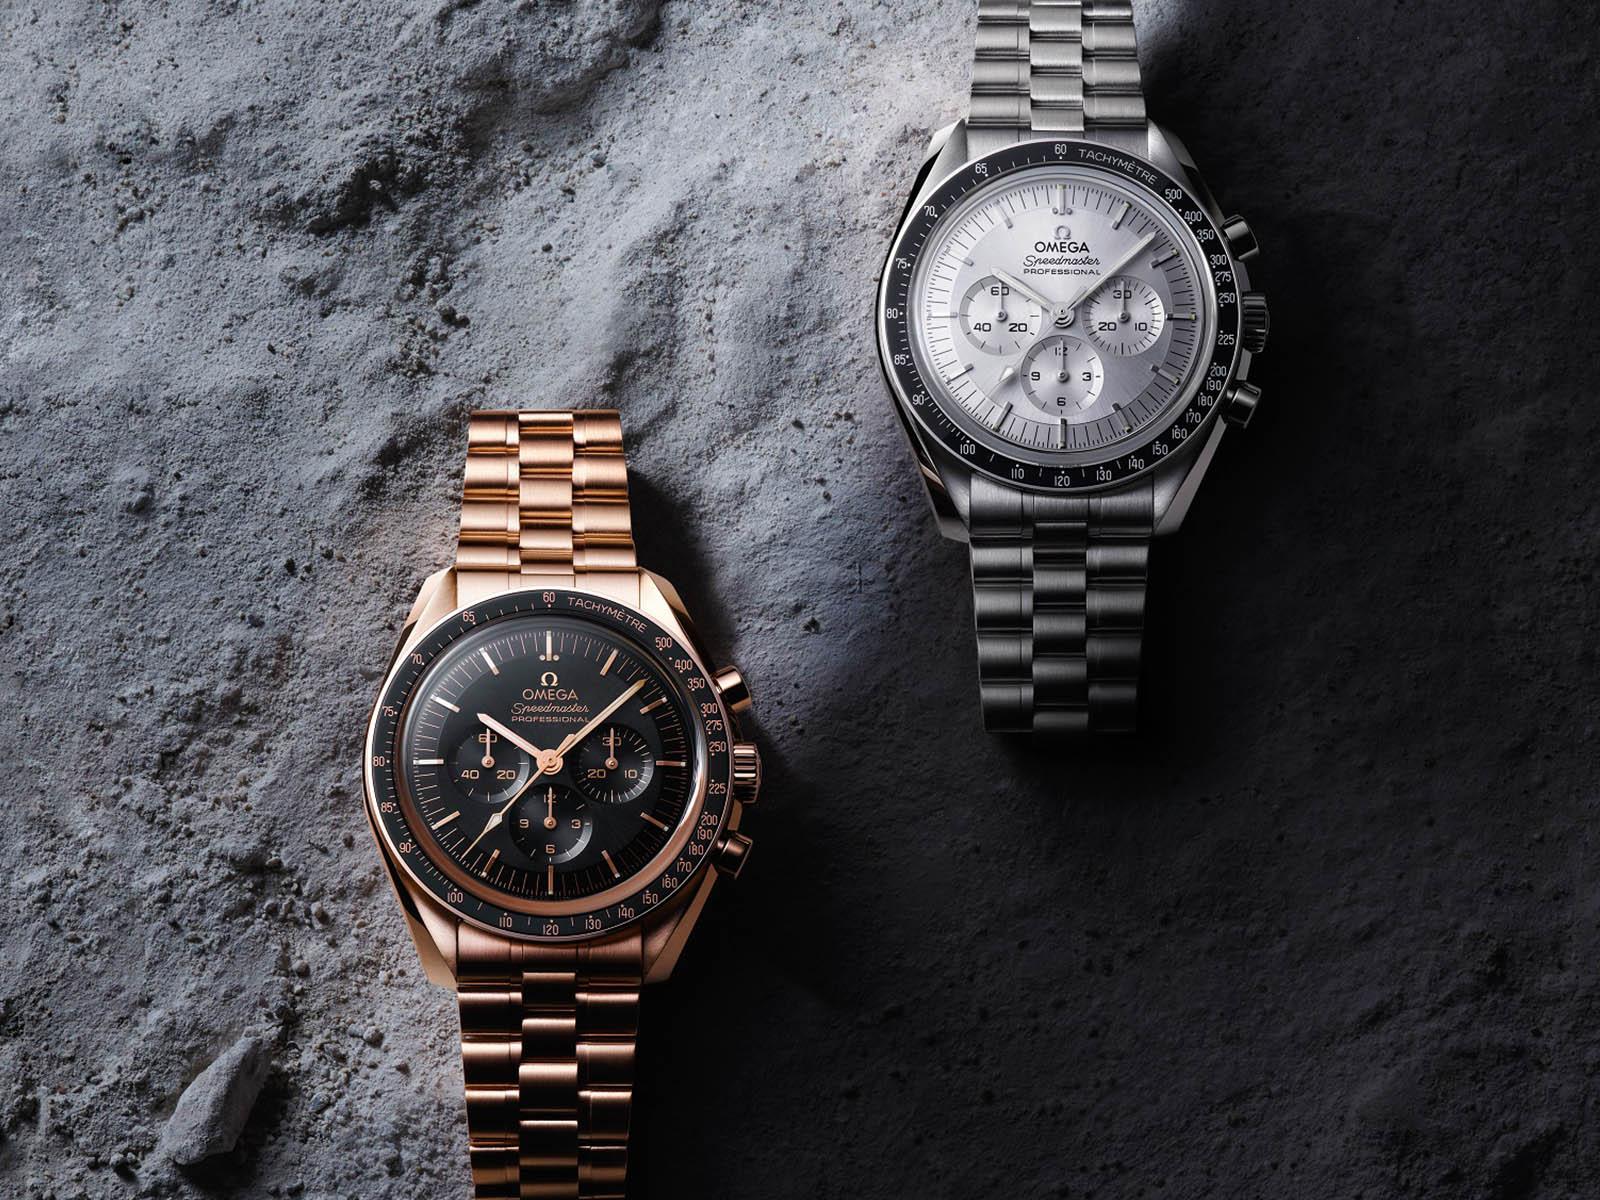 omega-speedmaster-moonwatch-professional-master-chronometer-2.jpg